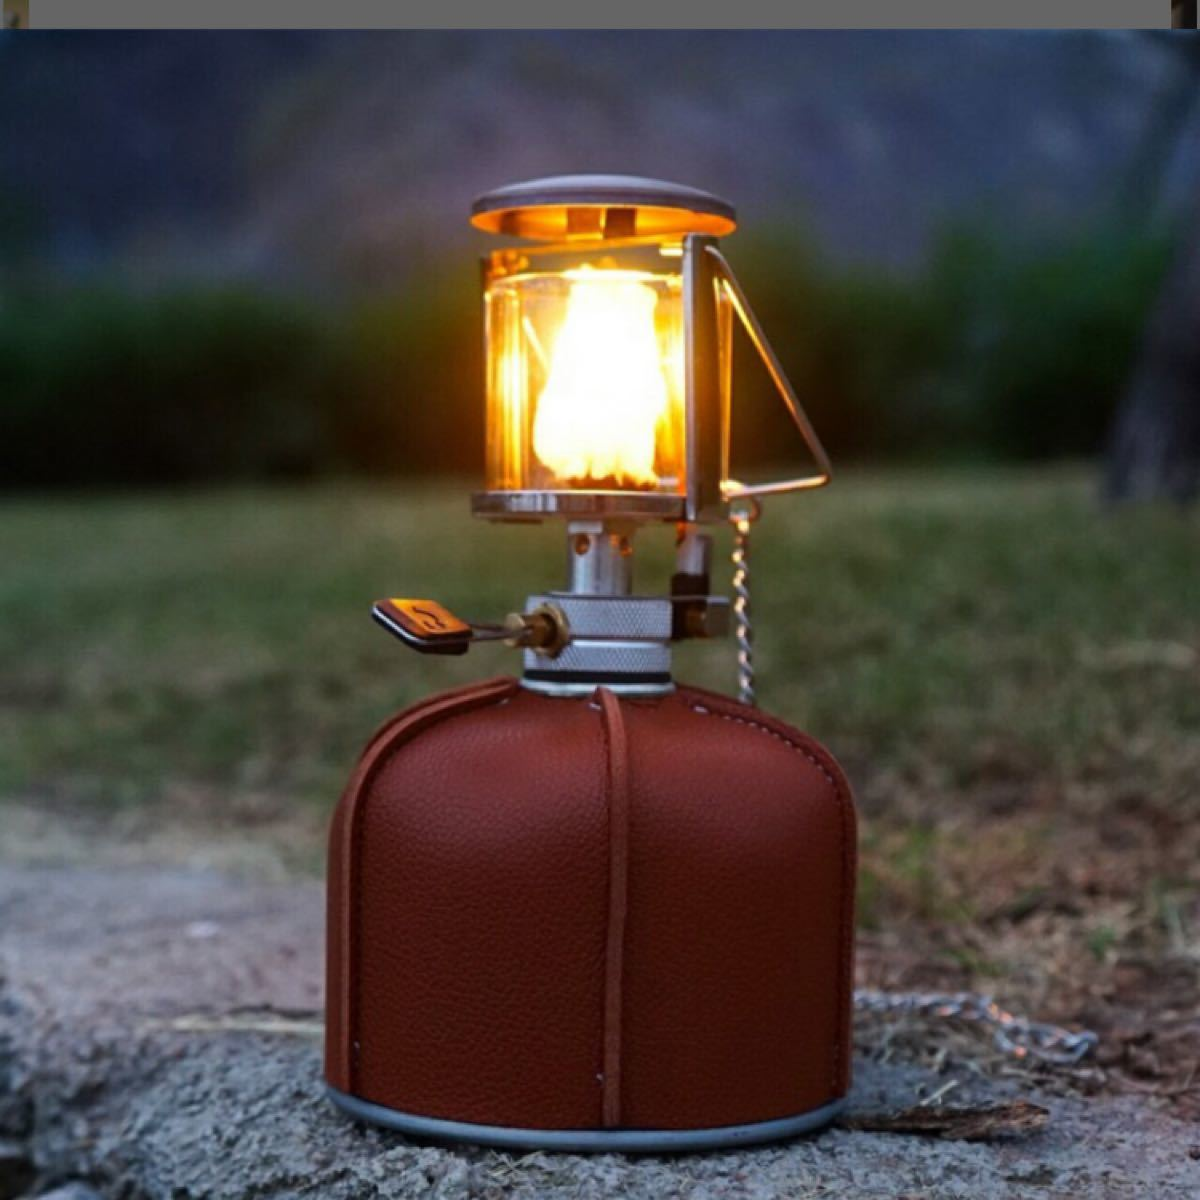 OD缶 カバー ルミエール ランタン キャンプ アウトドア ガス缶カバー